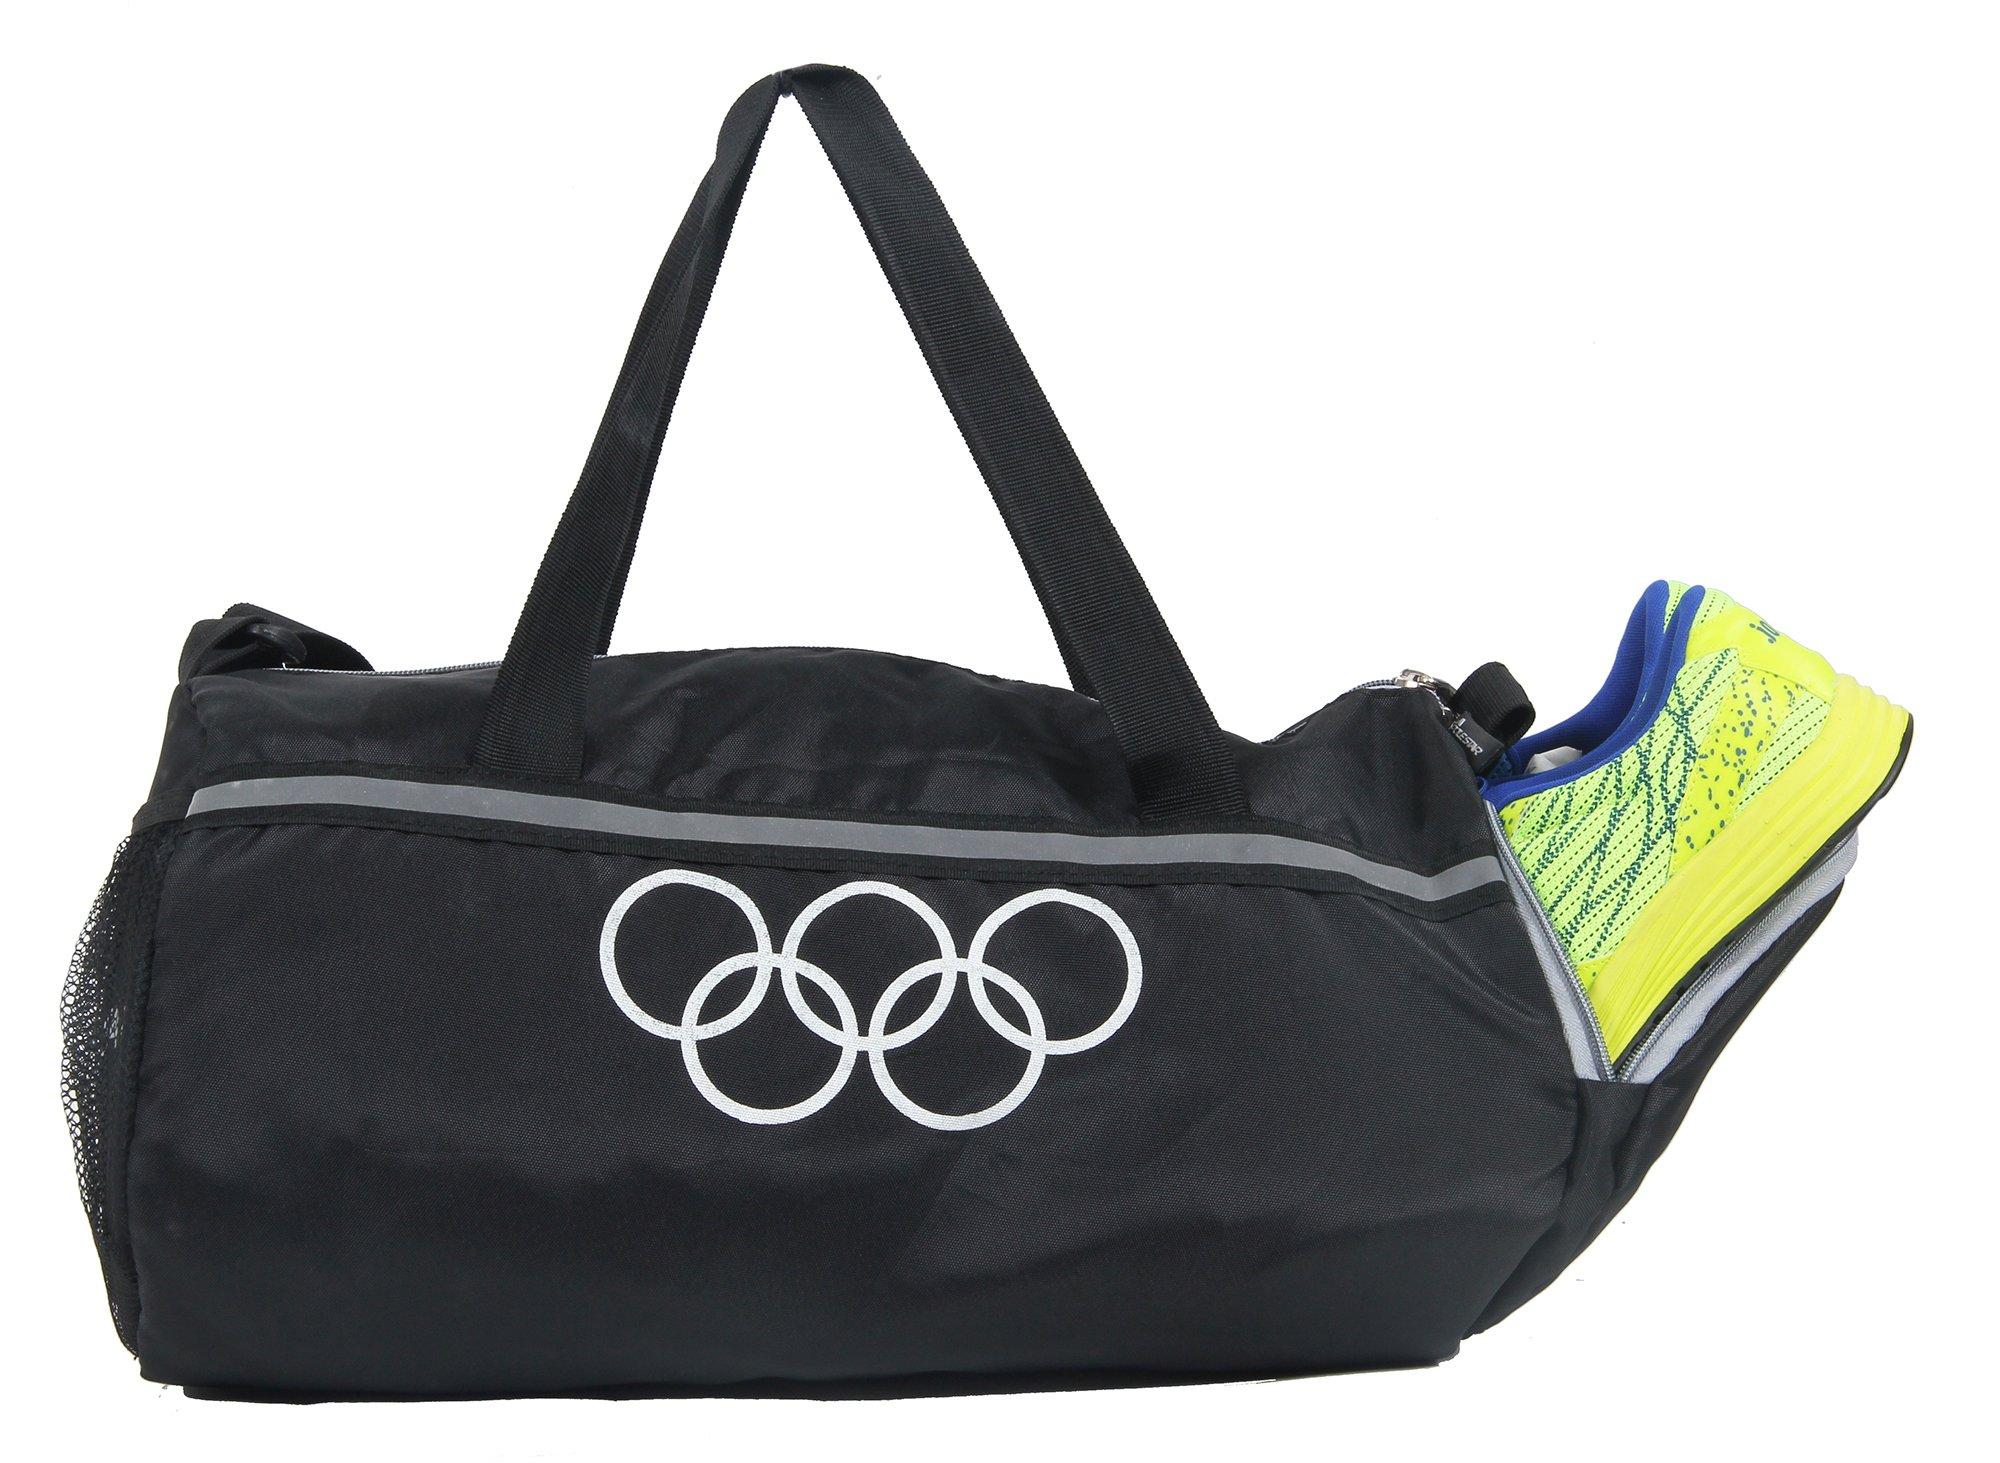 POLE STAR Polyester 26 L Black Gym Bag product image